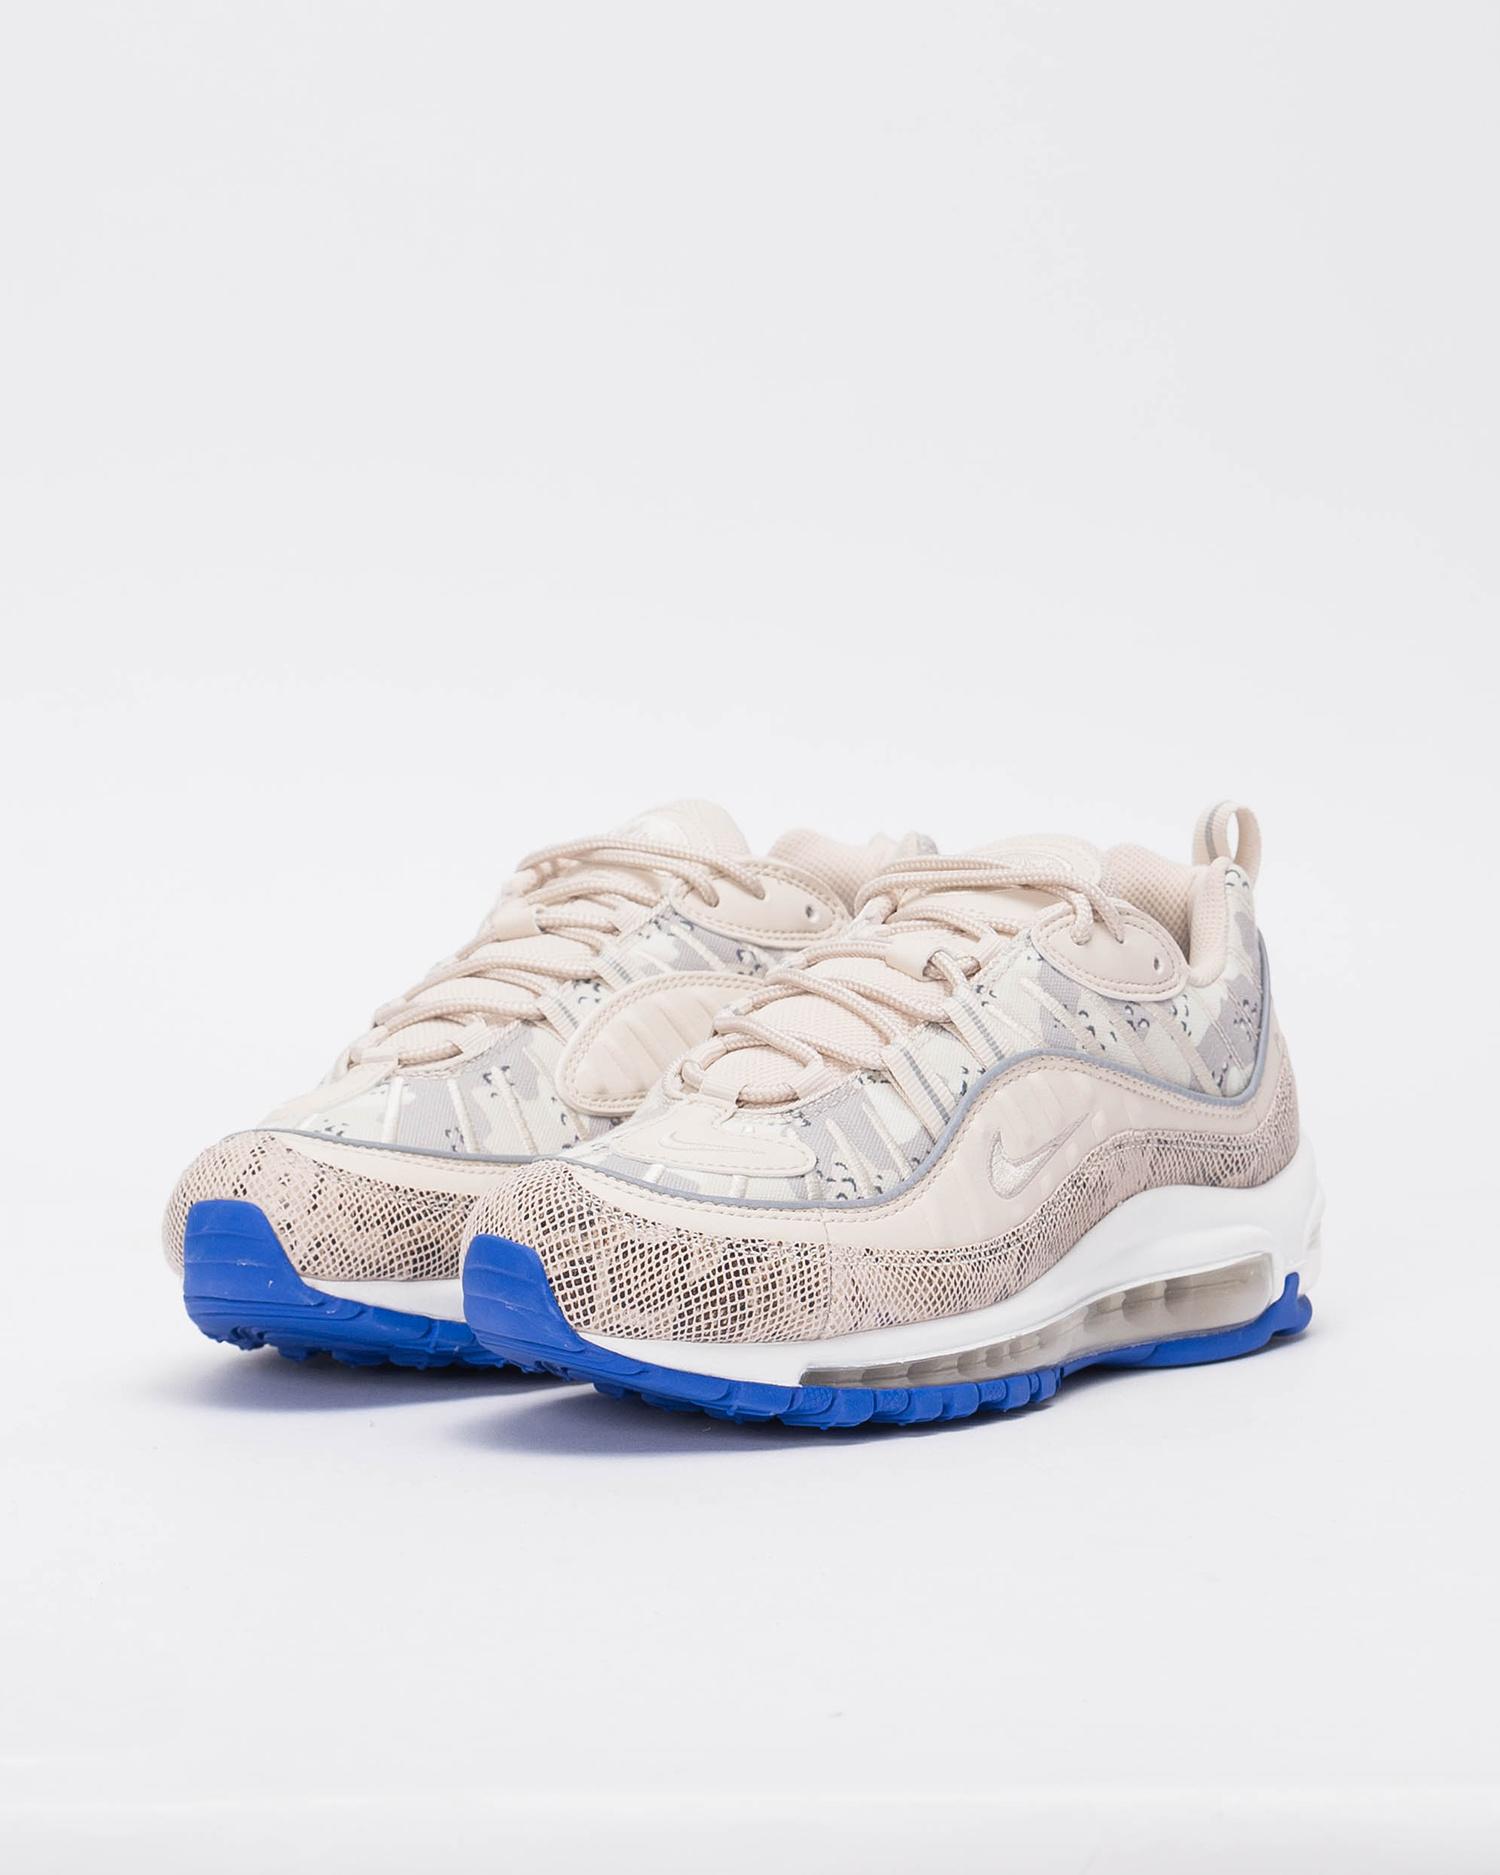 dcb2c42d46 Nike Nike W Air Max 98 Premium Lt orewood brn/Lt orewood Brn ...